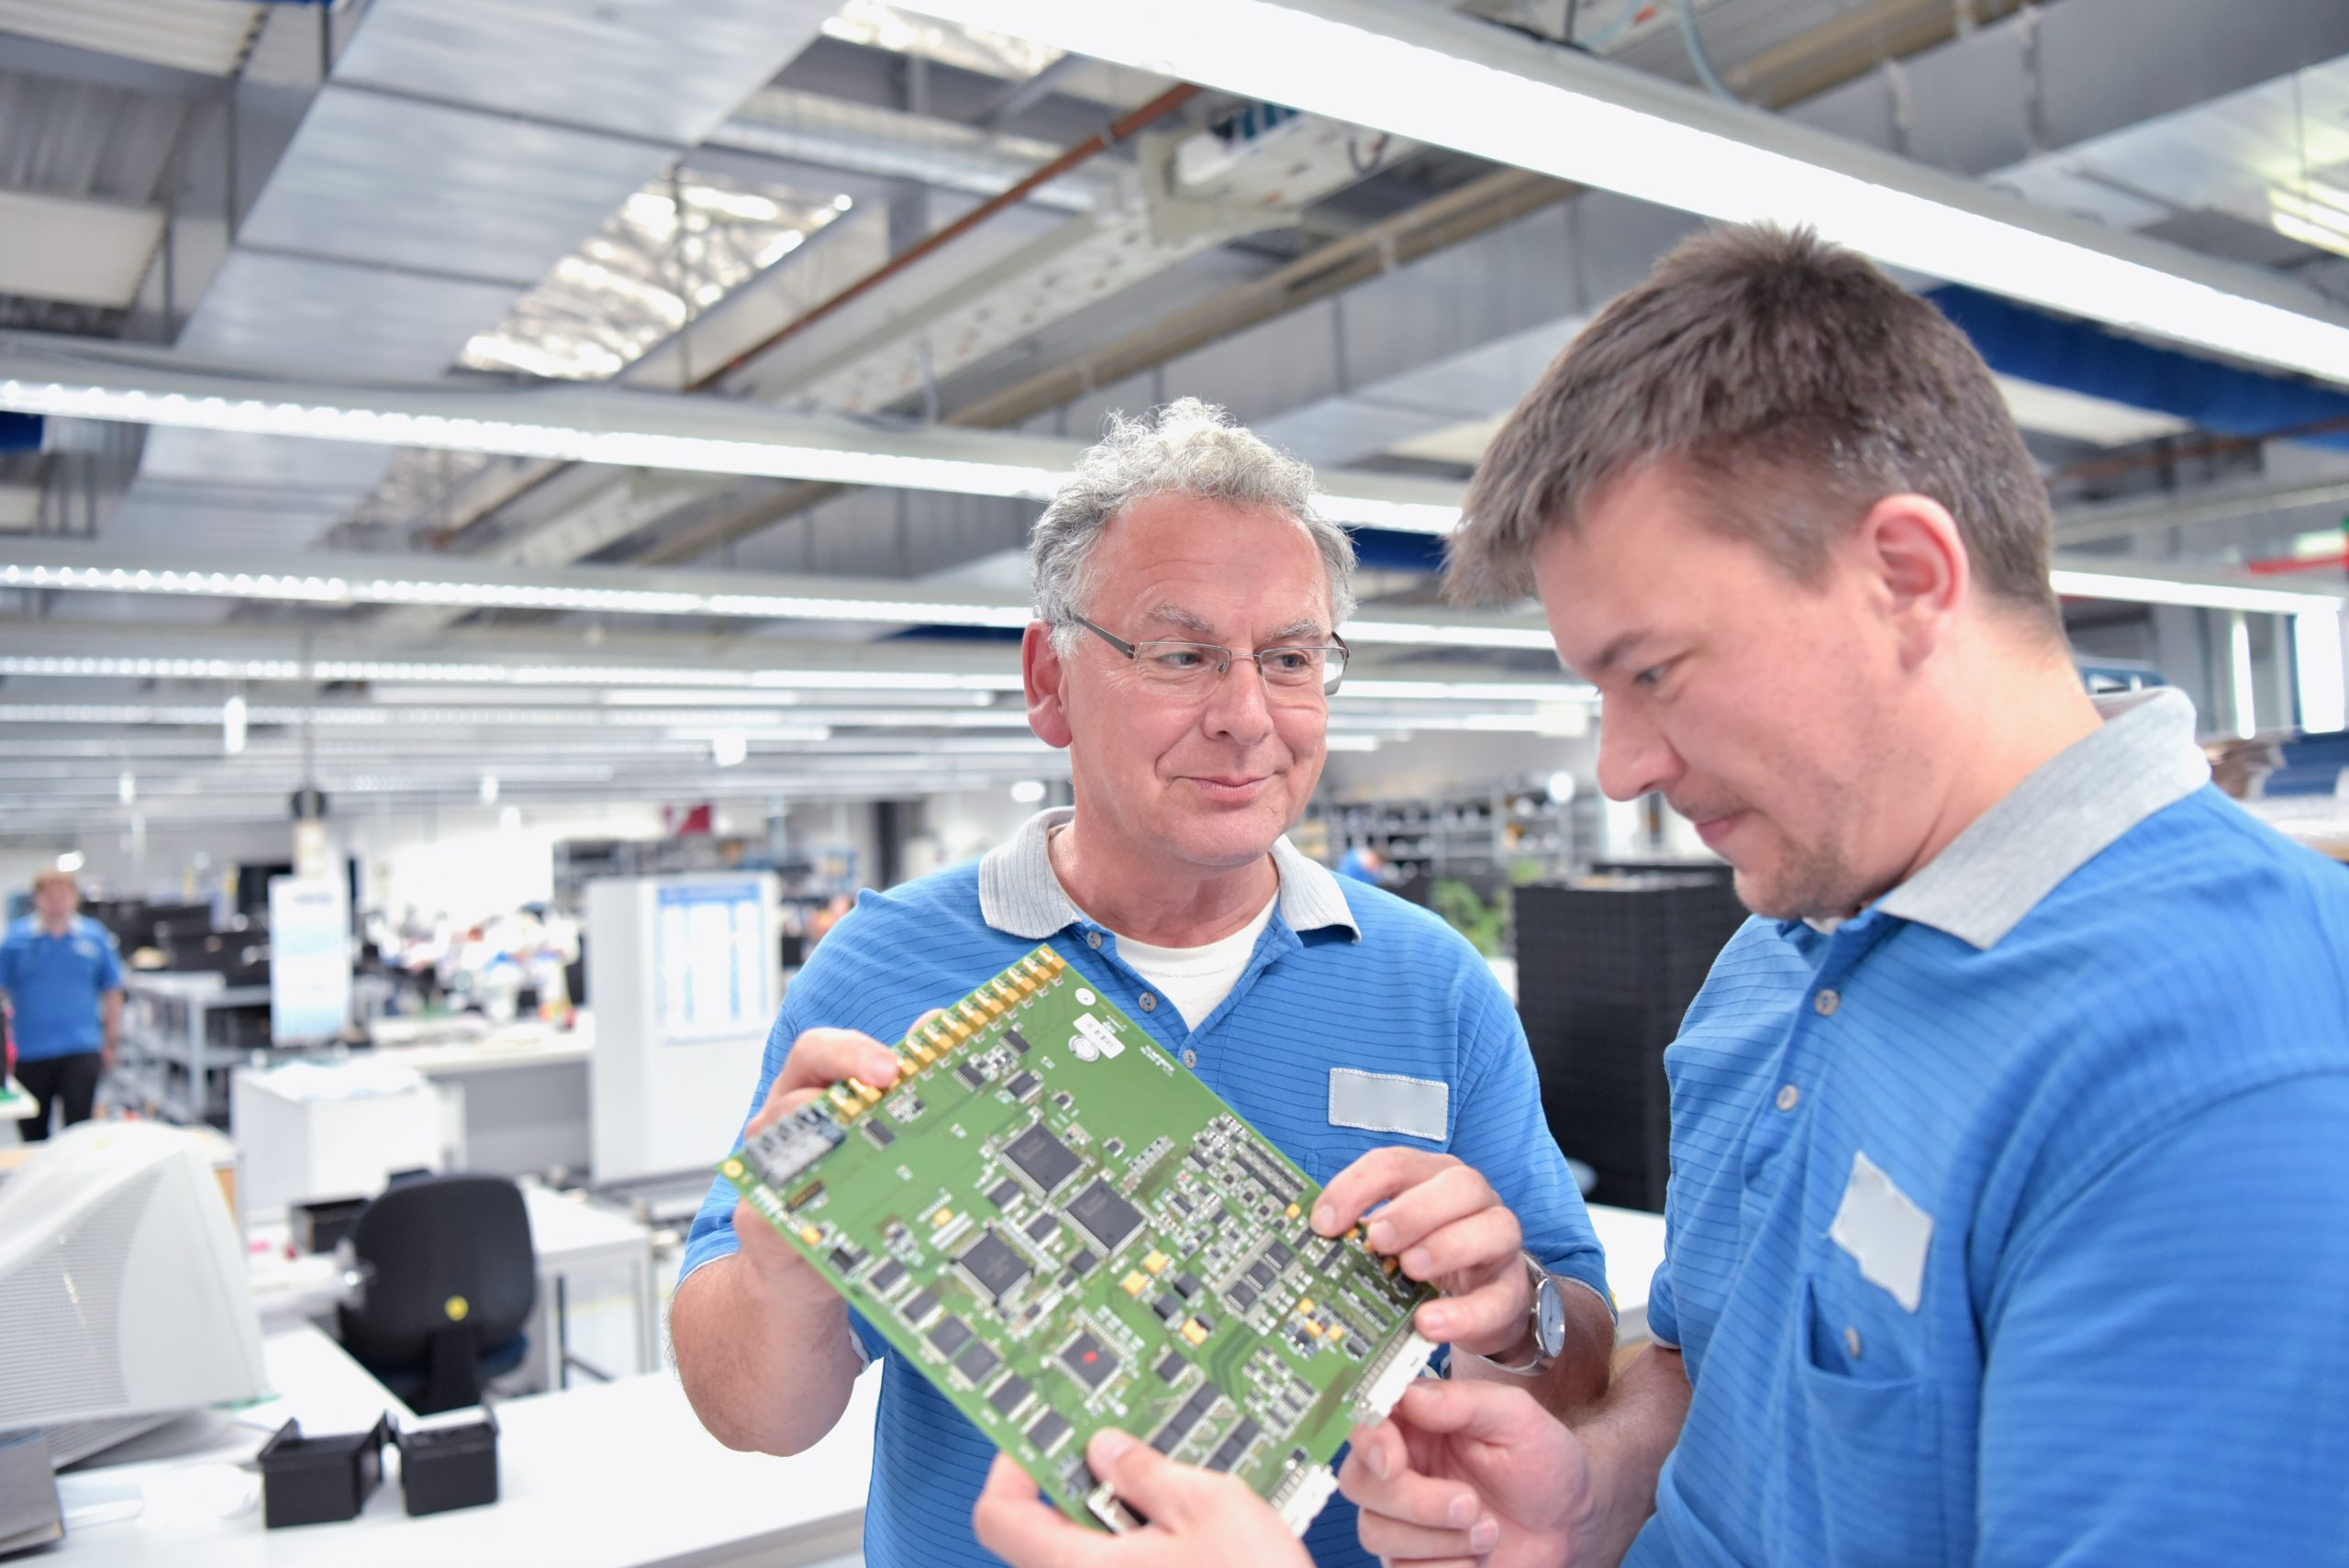 Teamwork: Techniker in der Elektronikfabrik bei Besprechnung über Fertigung von Platinen //  Technician in the electronics factory discussing the manufacture of printed circuit boards